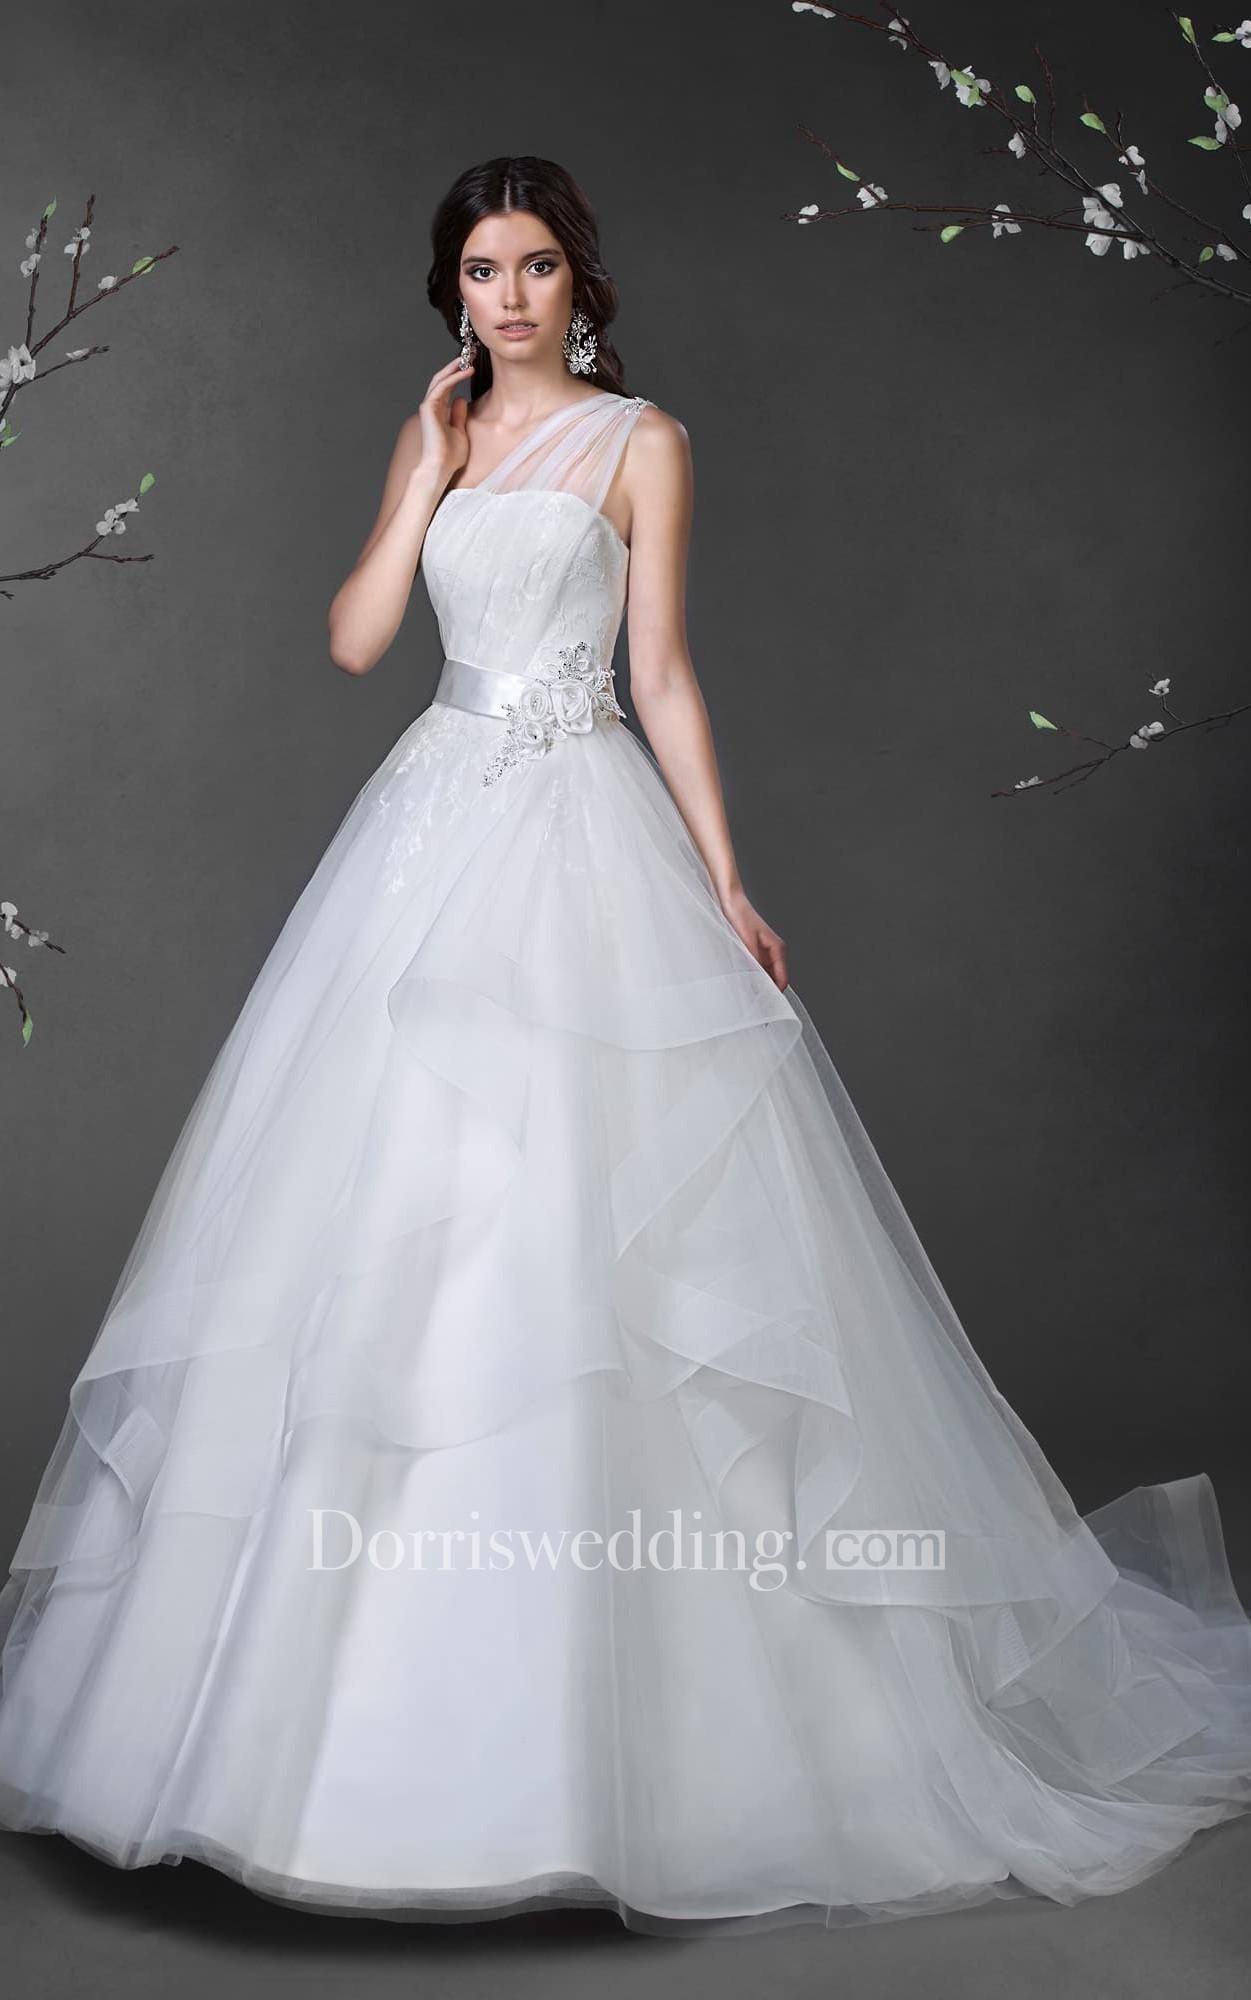 Concise elegant strapless sleeveless white satin&tulle